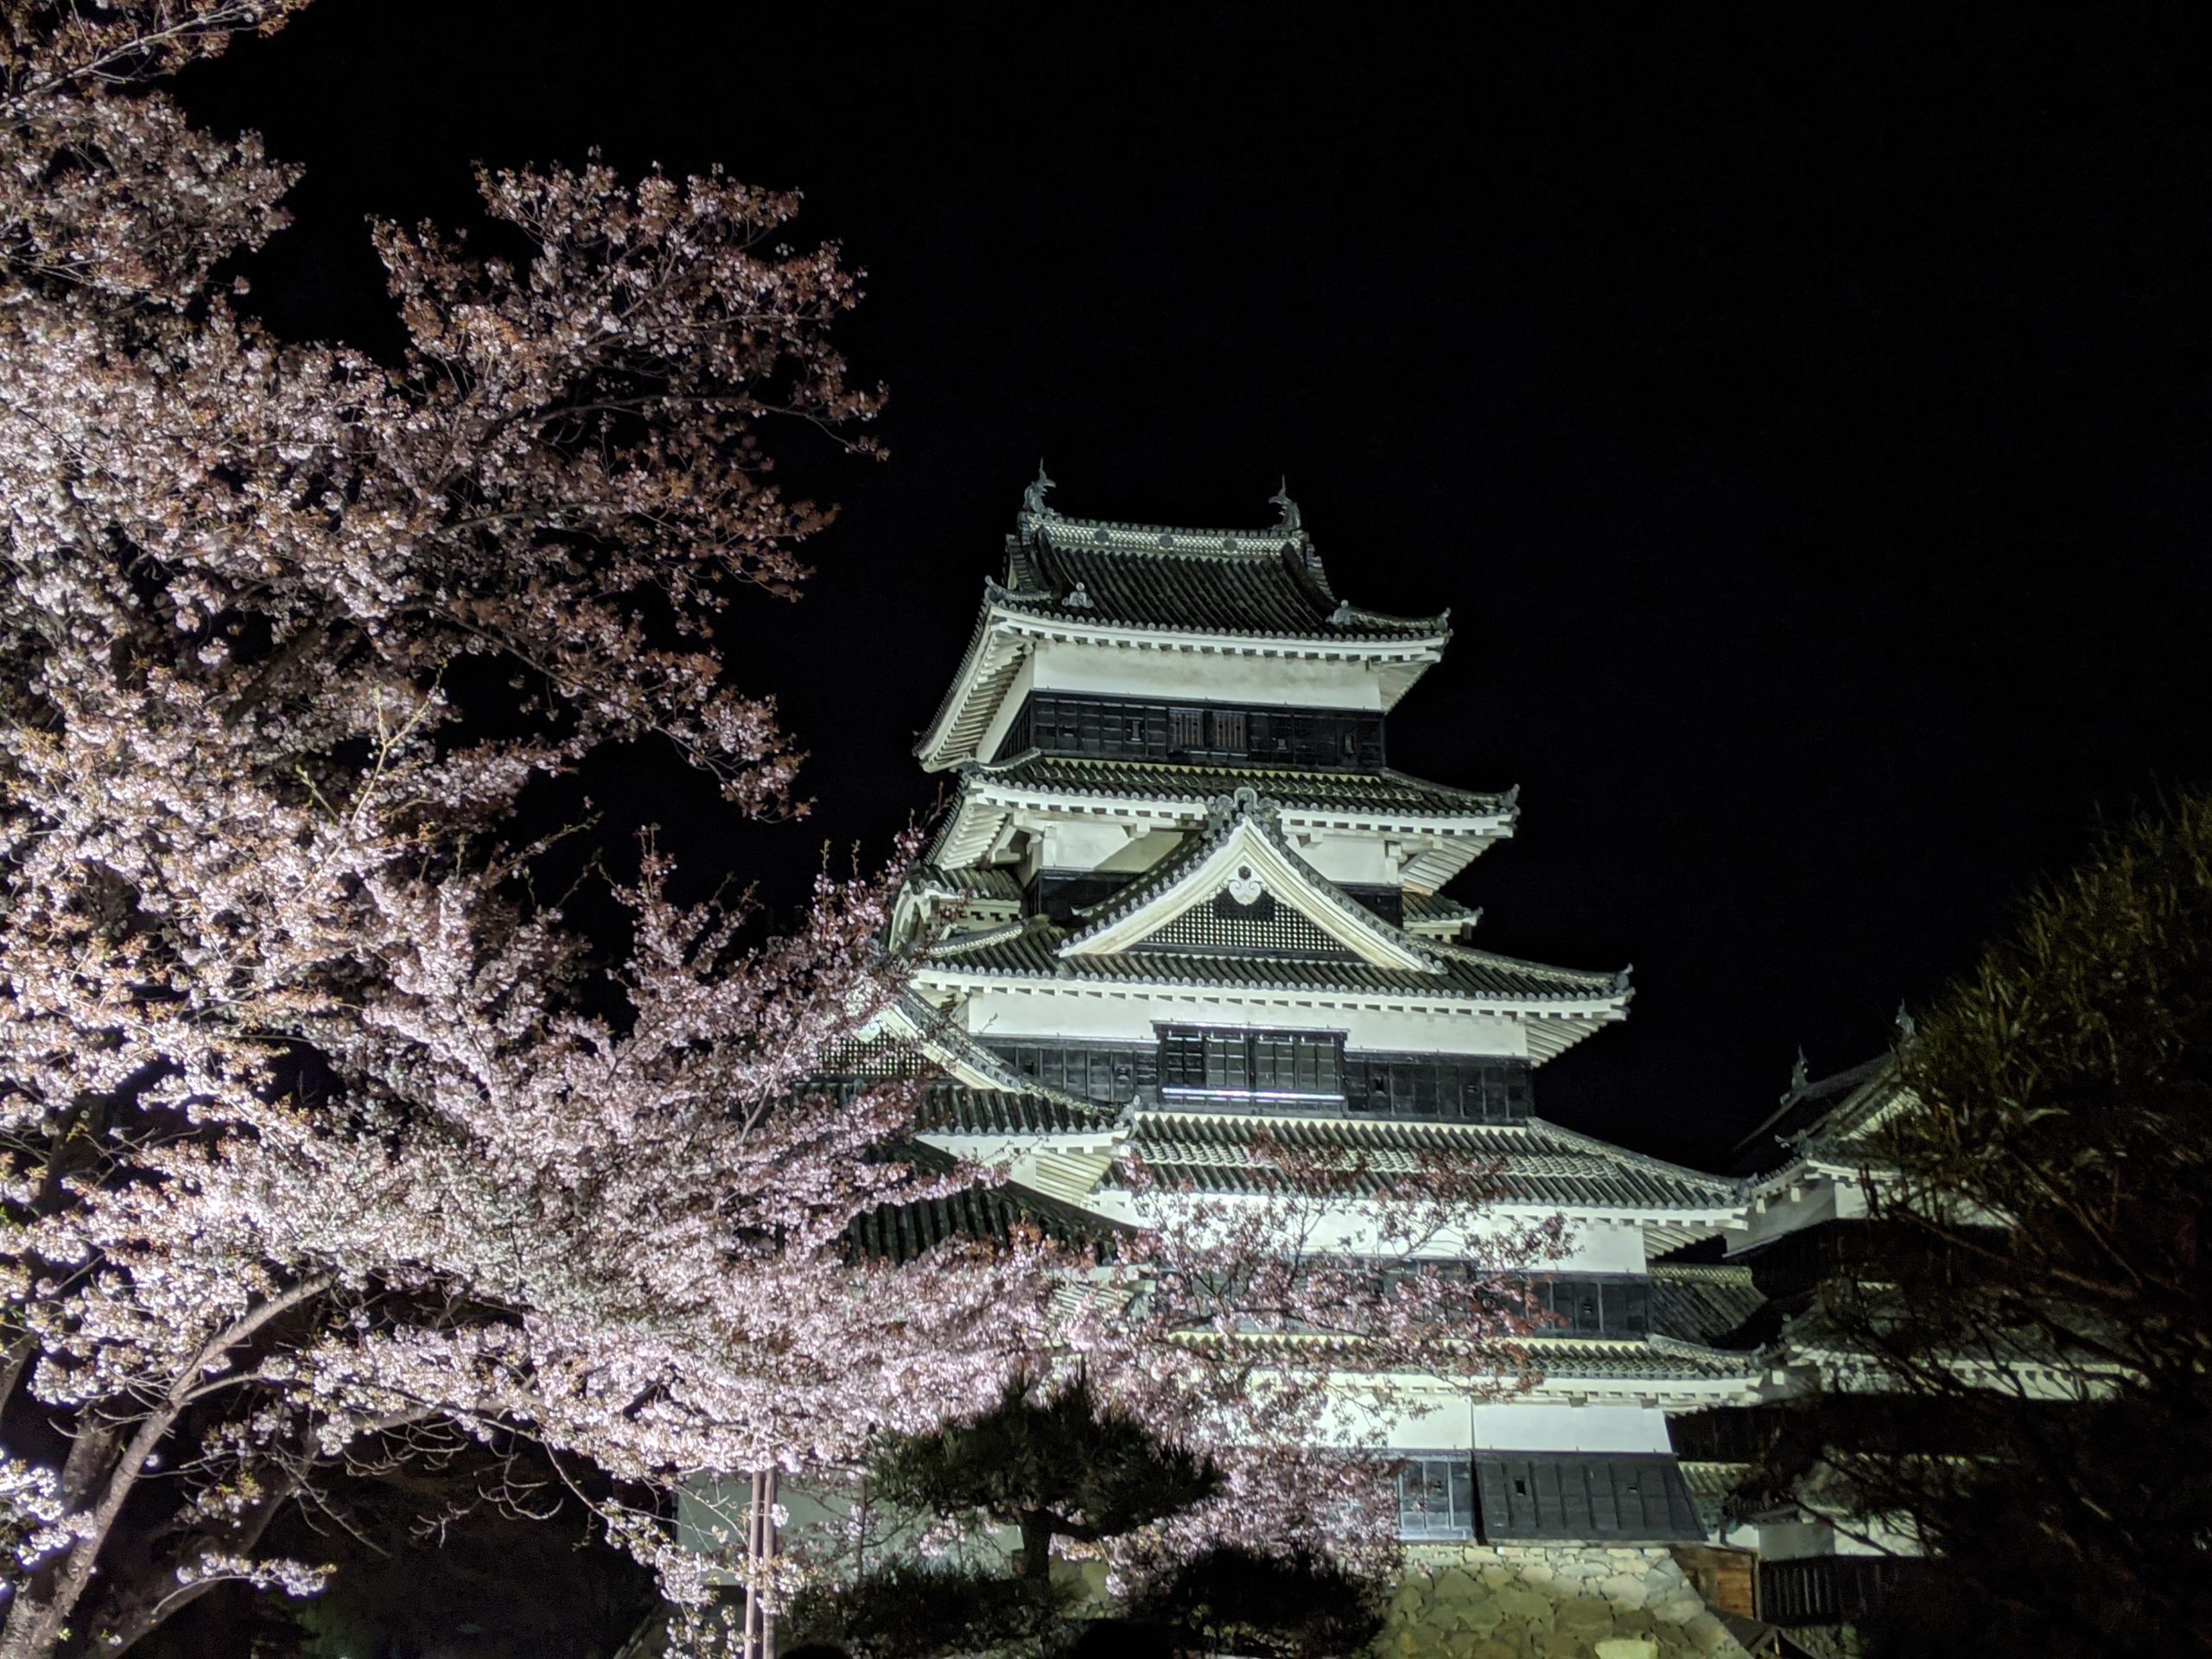 Sakura au Château de Matsumoto vue